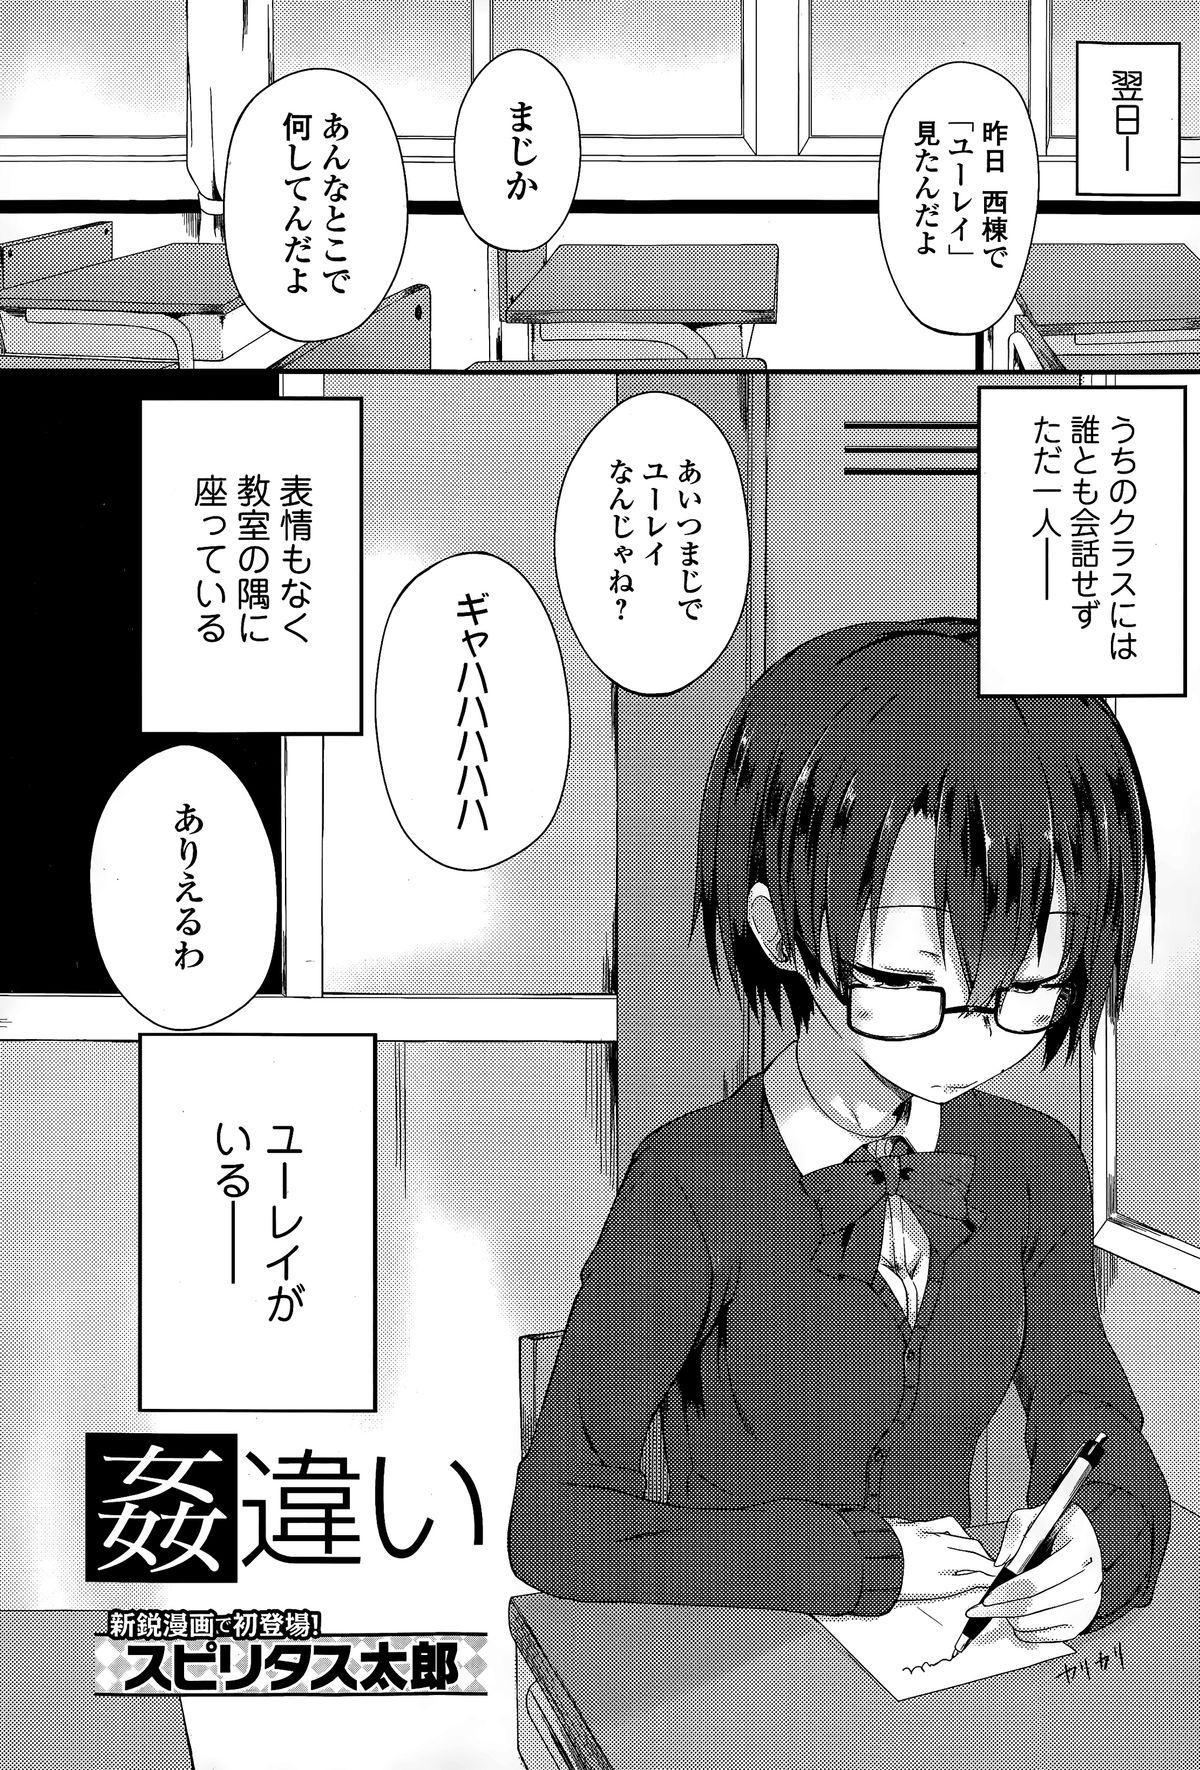 Comic Toutetsu 2015-02 Vol. 3 205